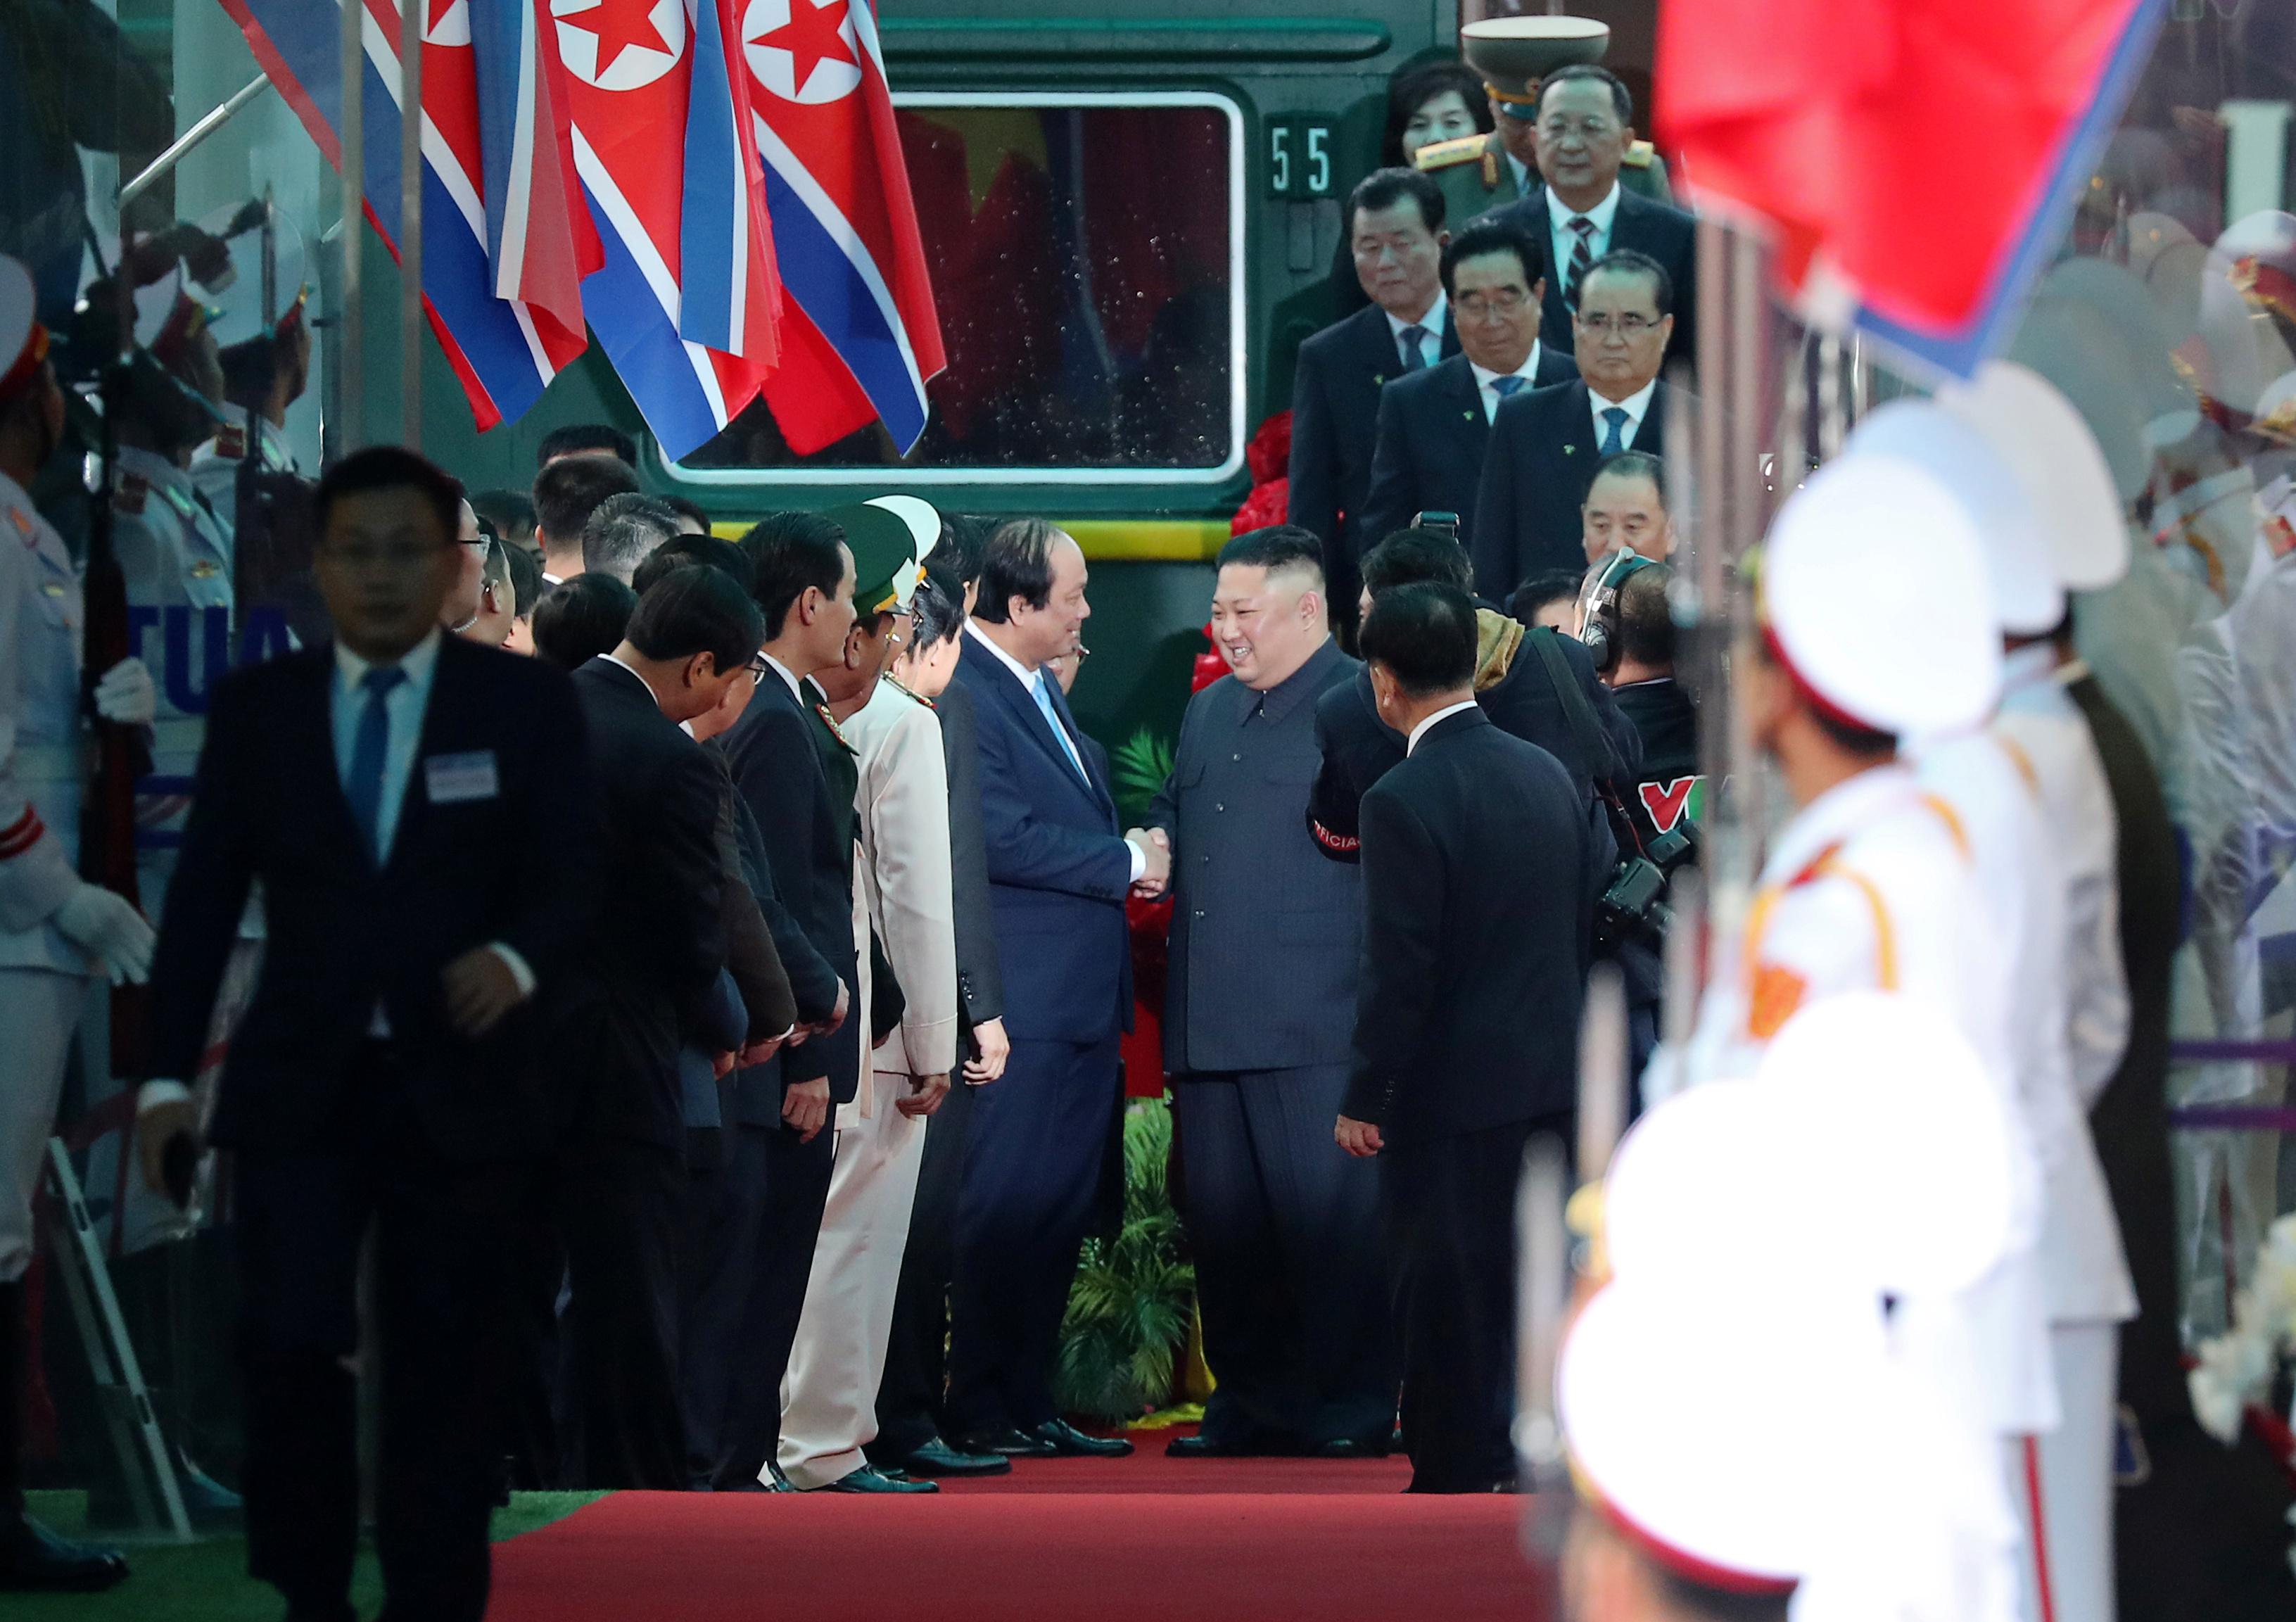 North Korea's leader Kim Jong Un arrives at the Dong Dang railway station, Vietnam, at the border with China, February 26, 2019.